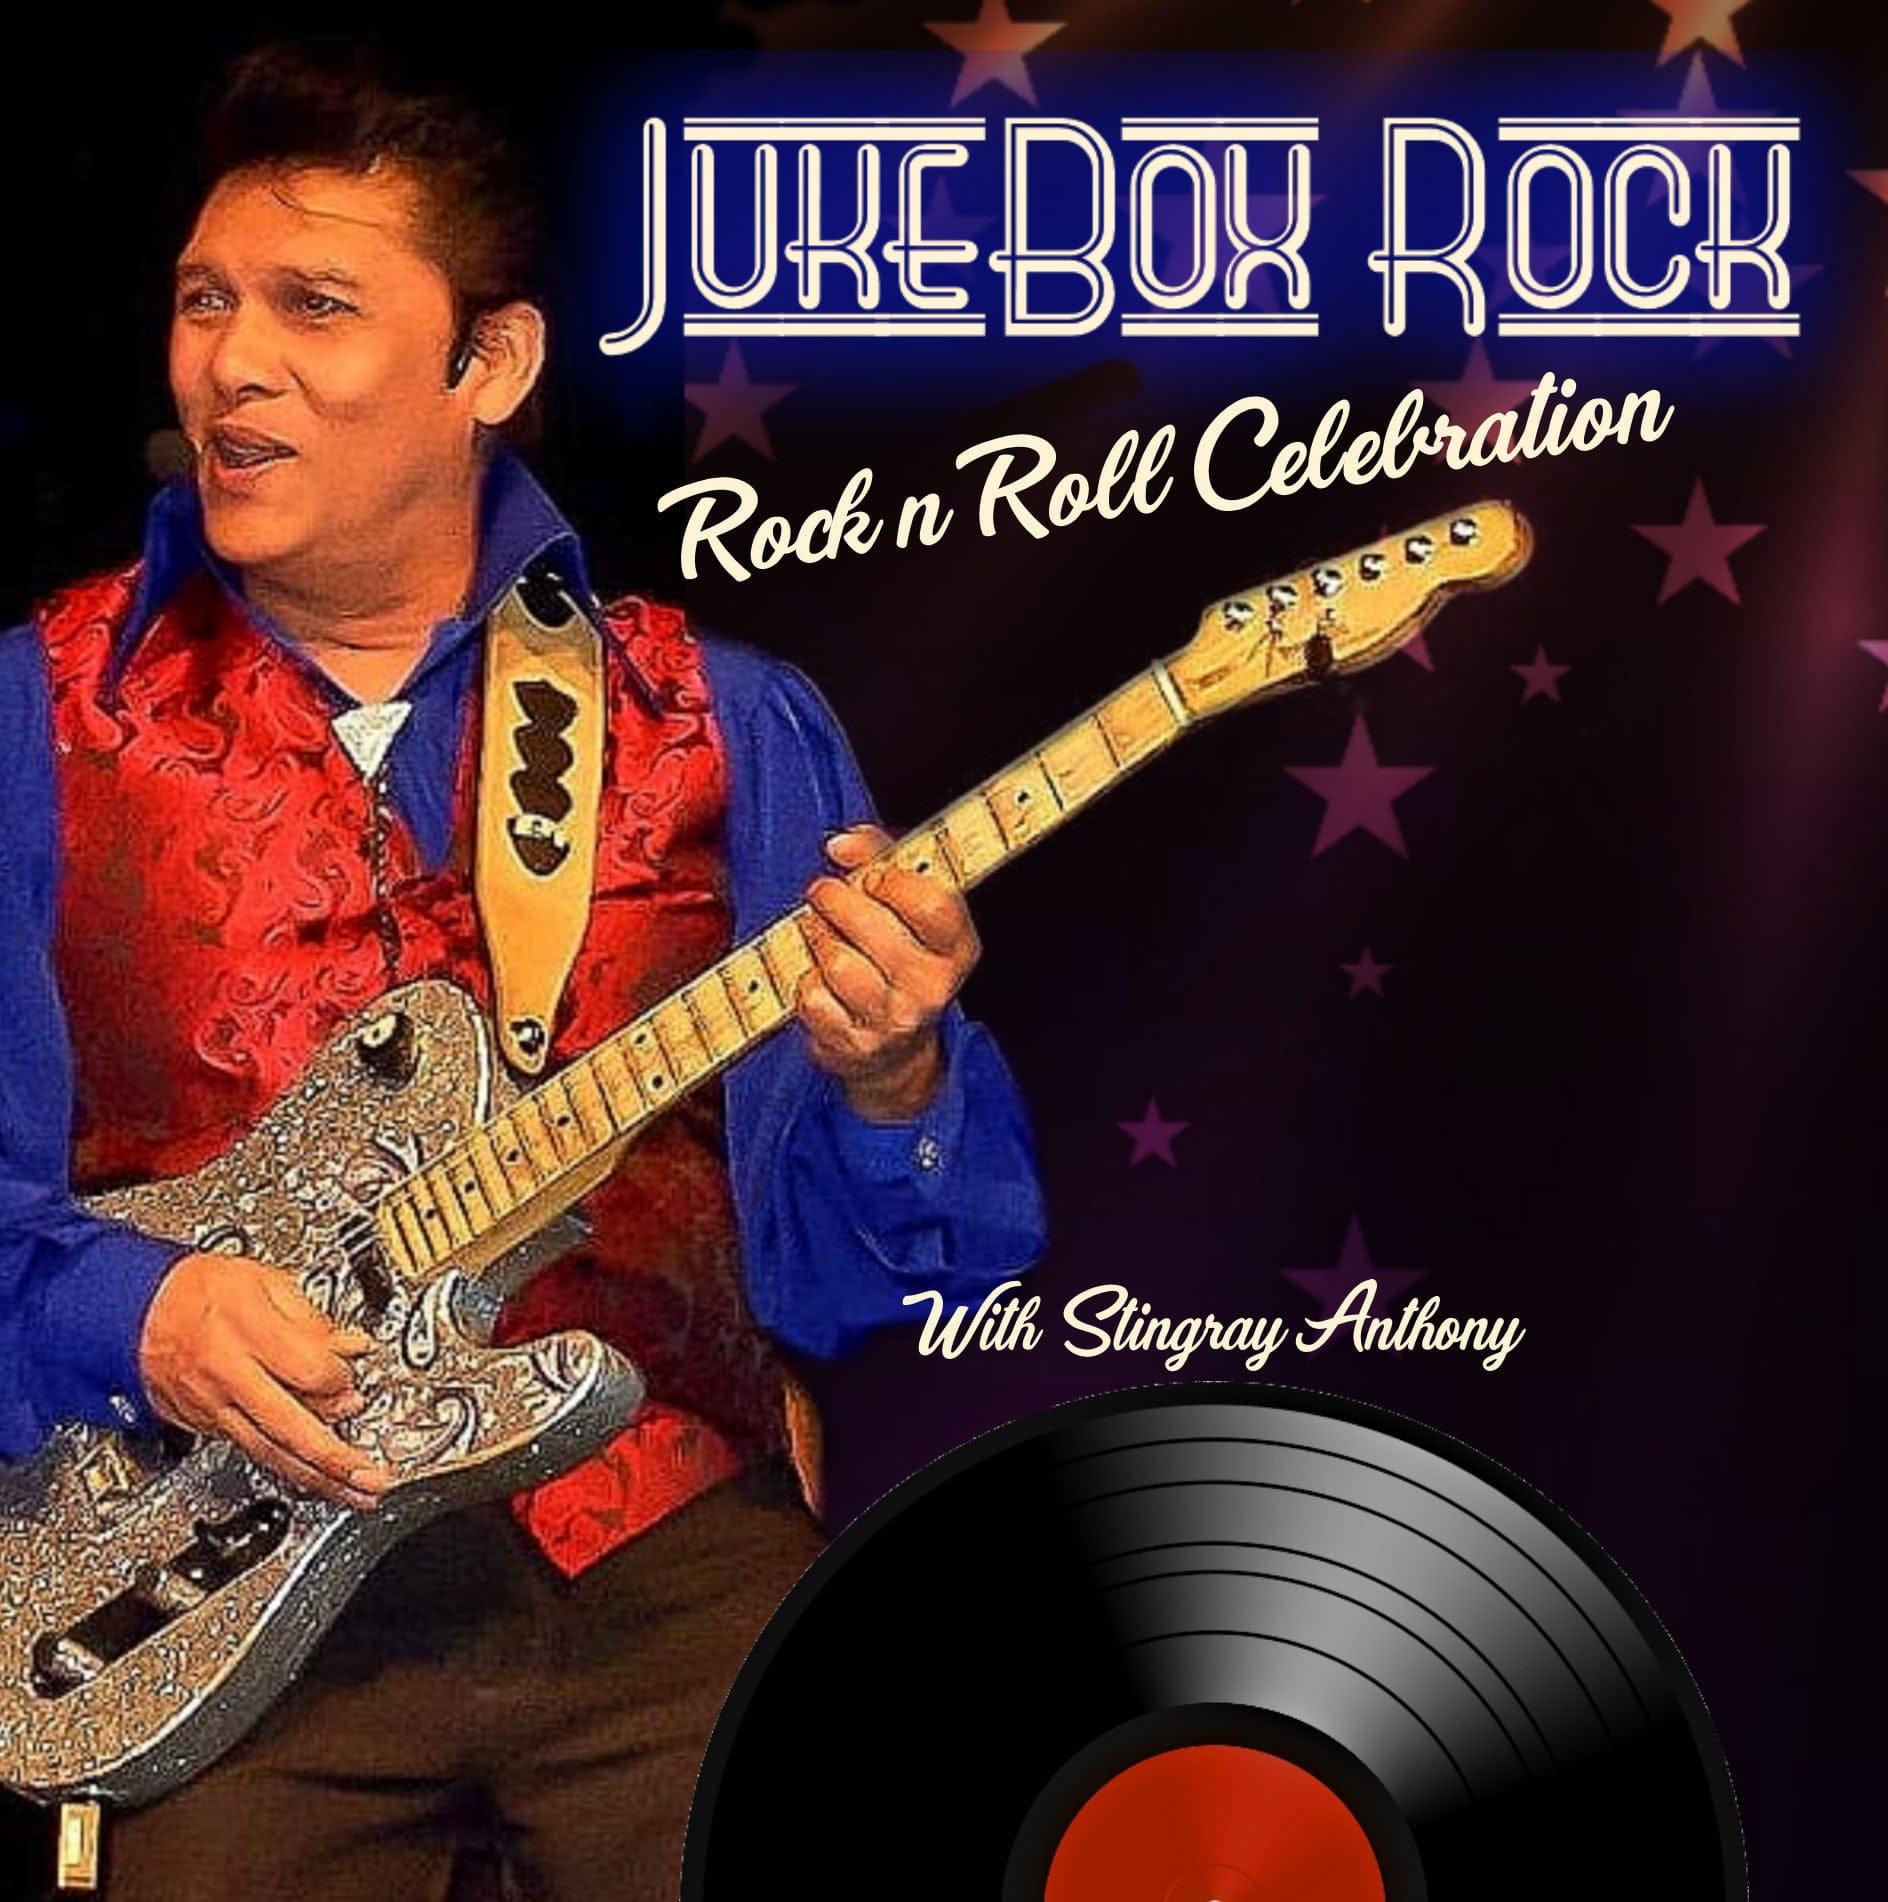 Jukebox Rock, presented by Tribute Masters